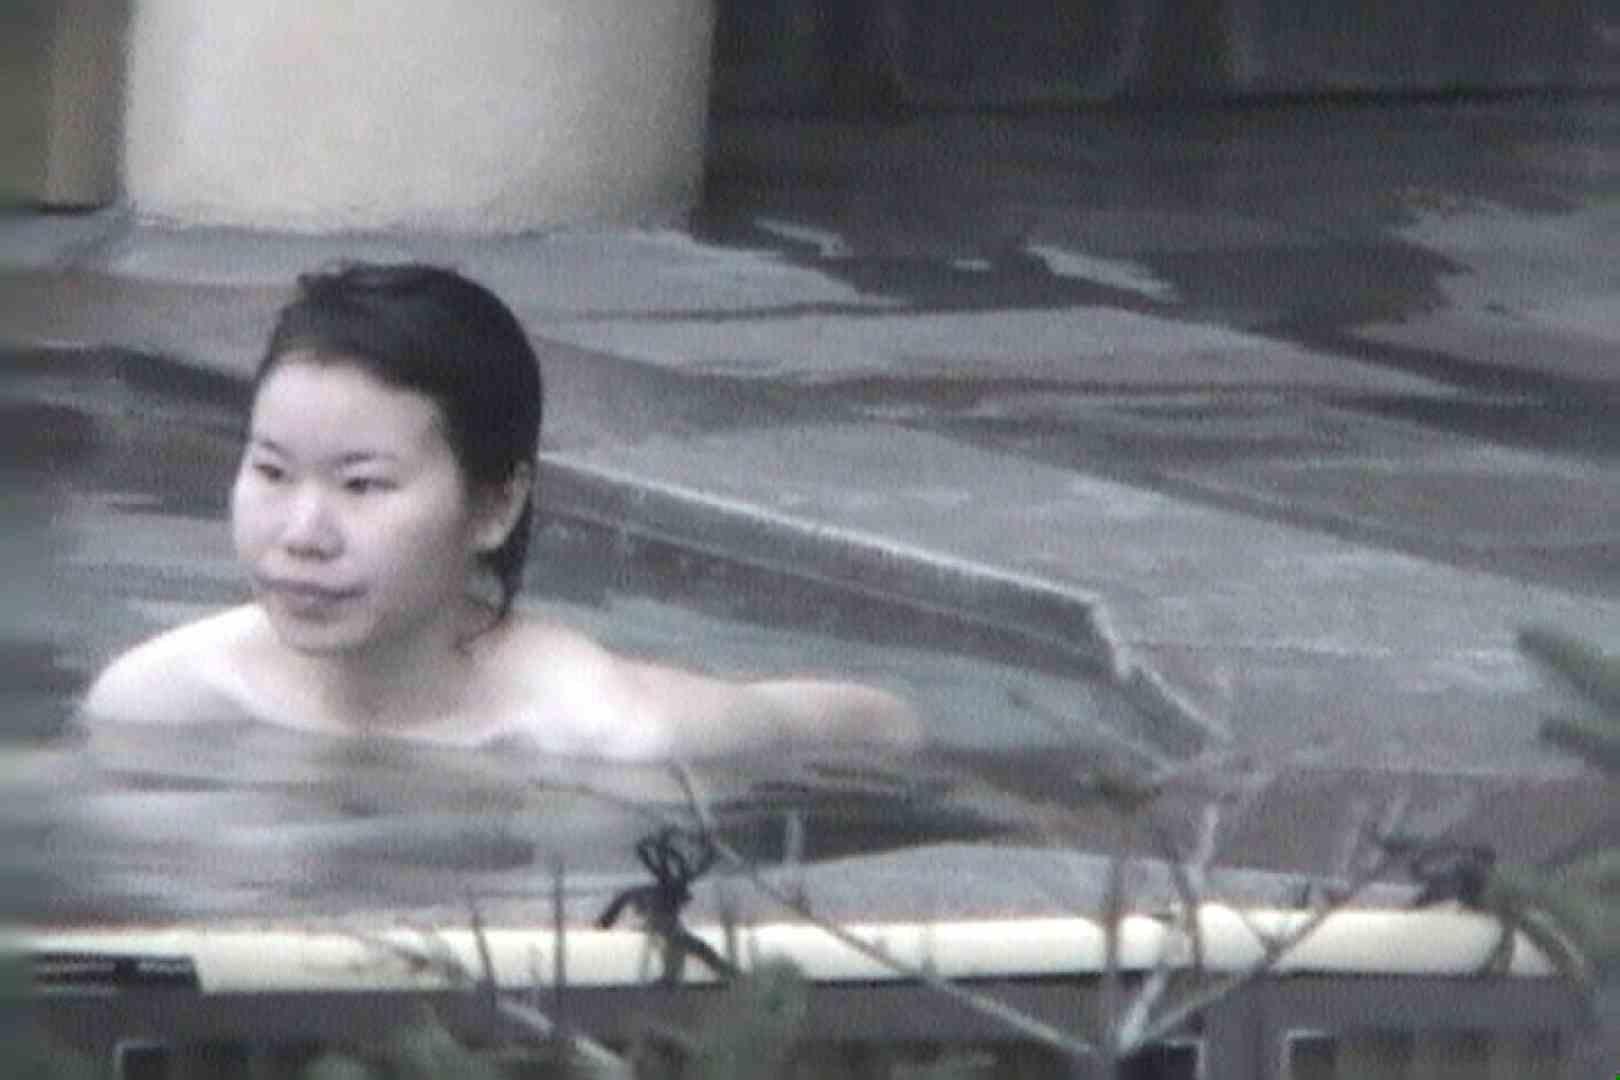 Aquaな露天風呂Vol.556 露天風呂編 | 盗撮シリーズ  99PIX 31